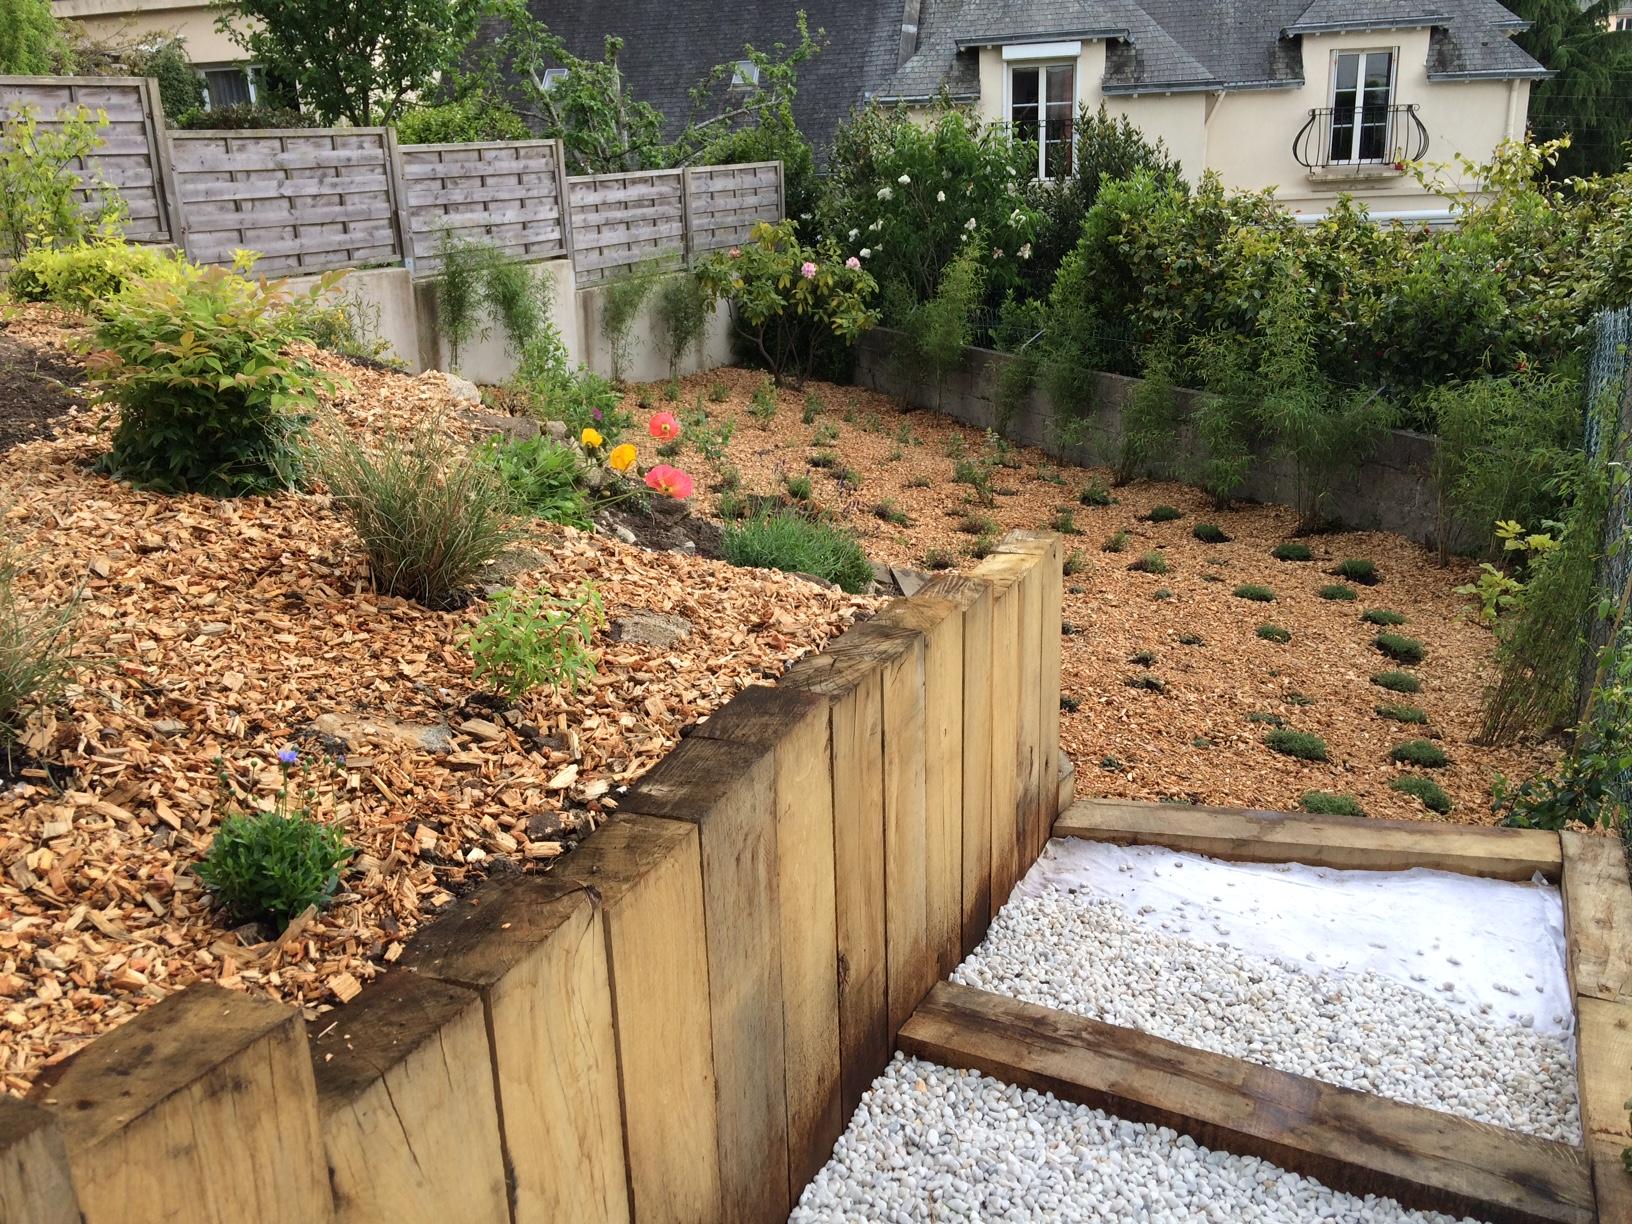 Cornouaille jardin cr ation et entretien de jardins en for Vide jardin finistere 2016